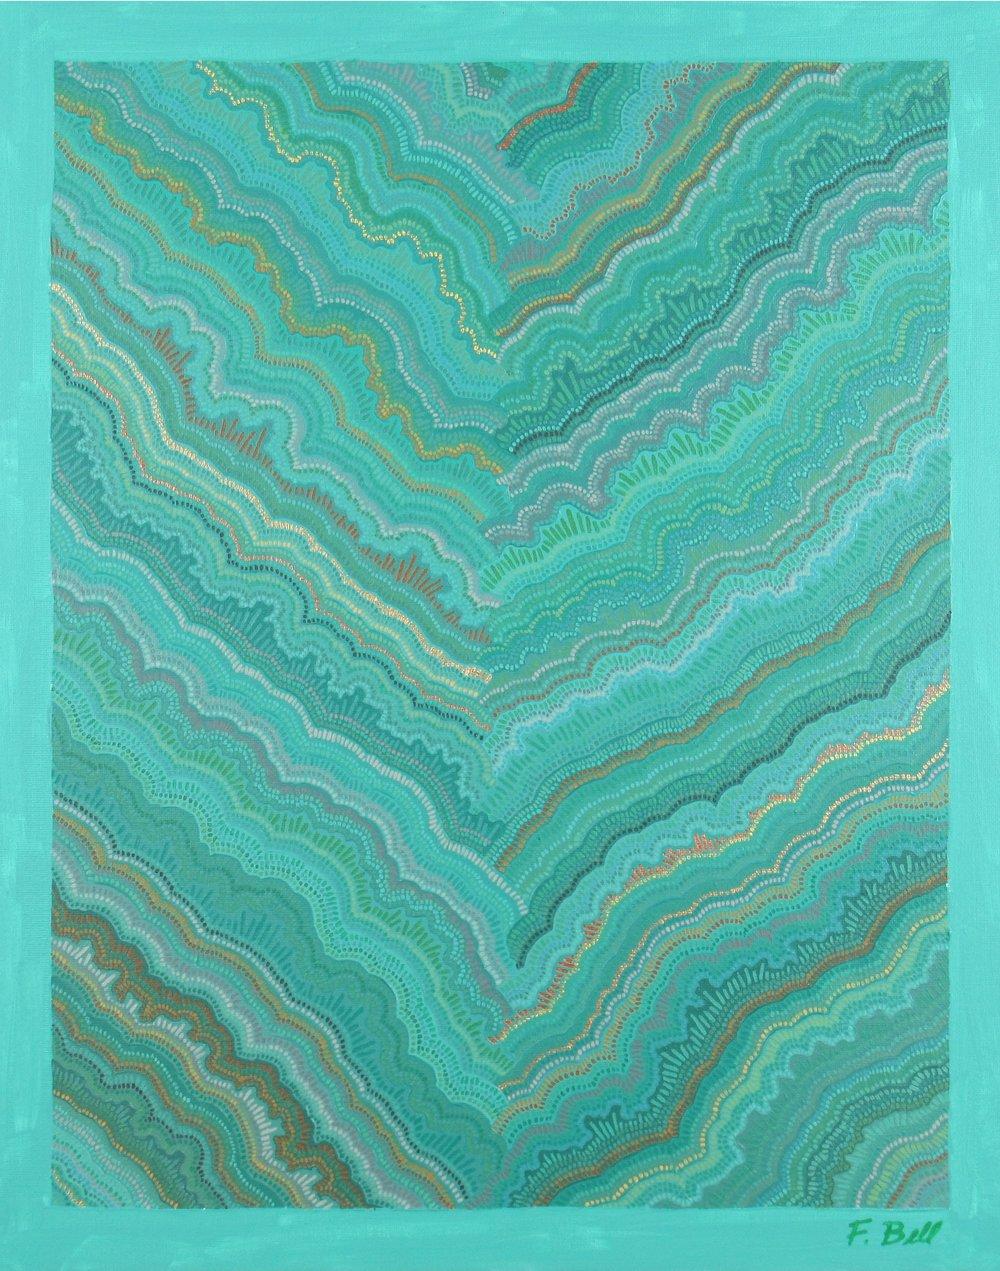 Birch II , 2017, 16x20, acrylic on canvas. sold.